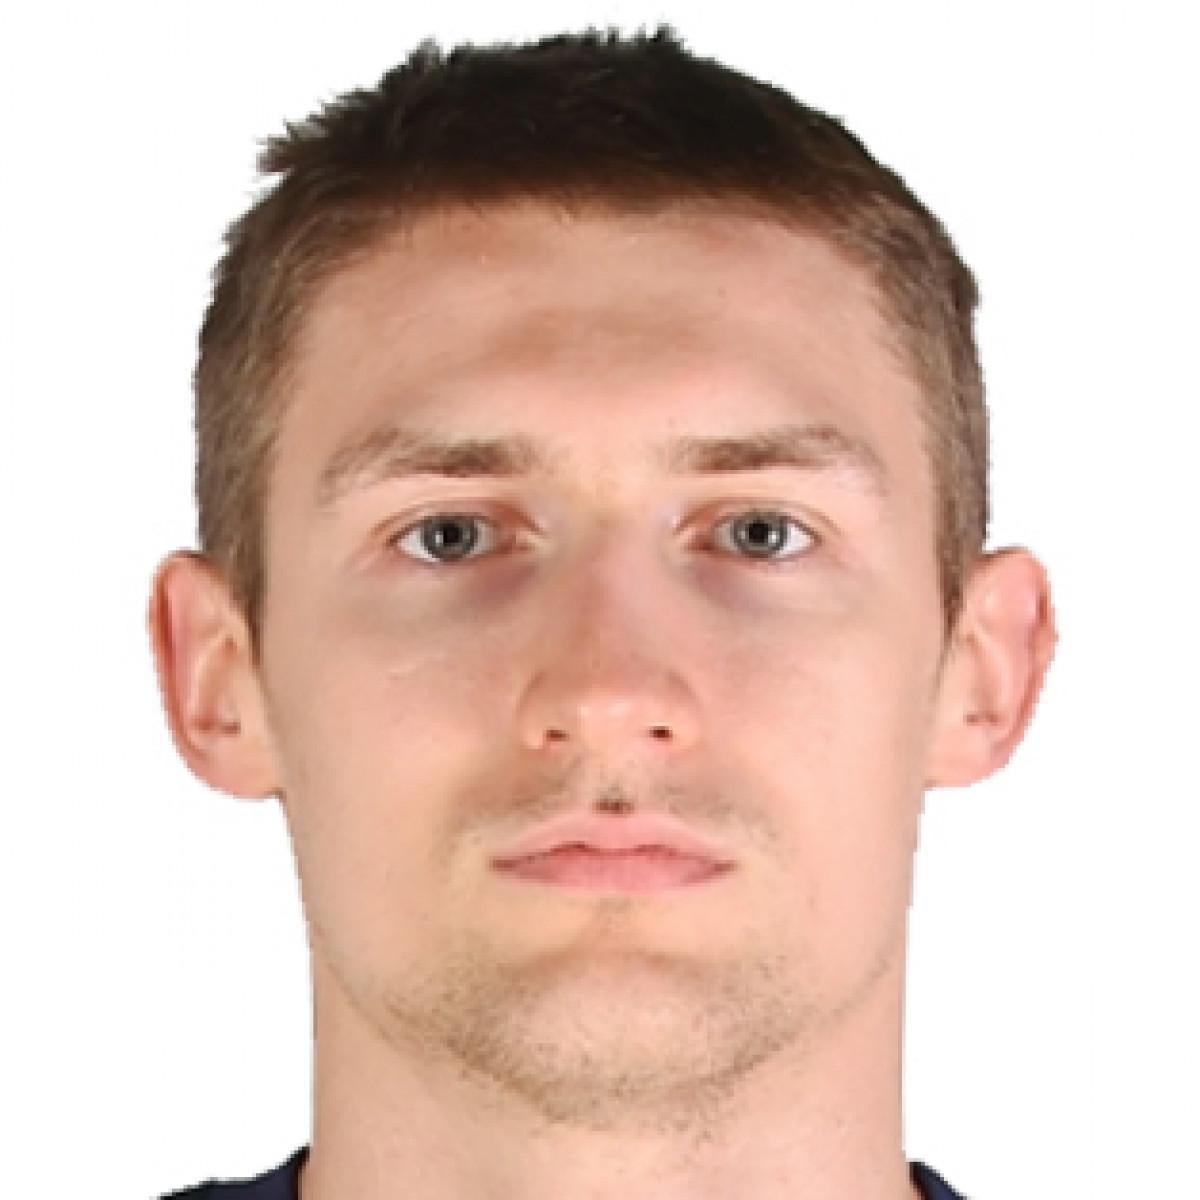 Kacper Radwanski